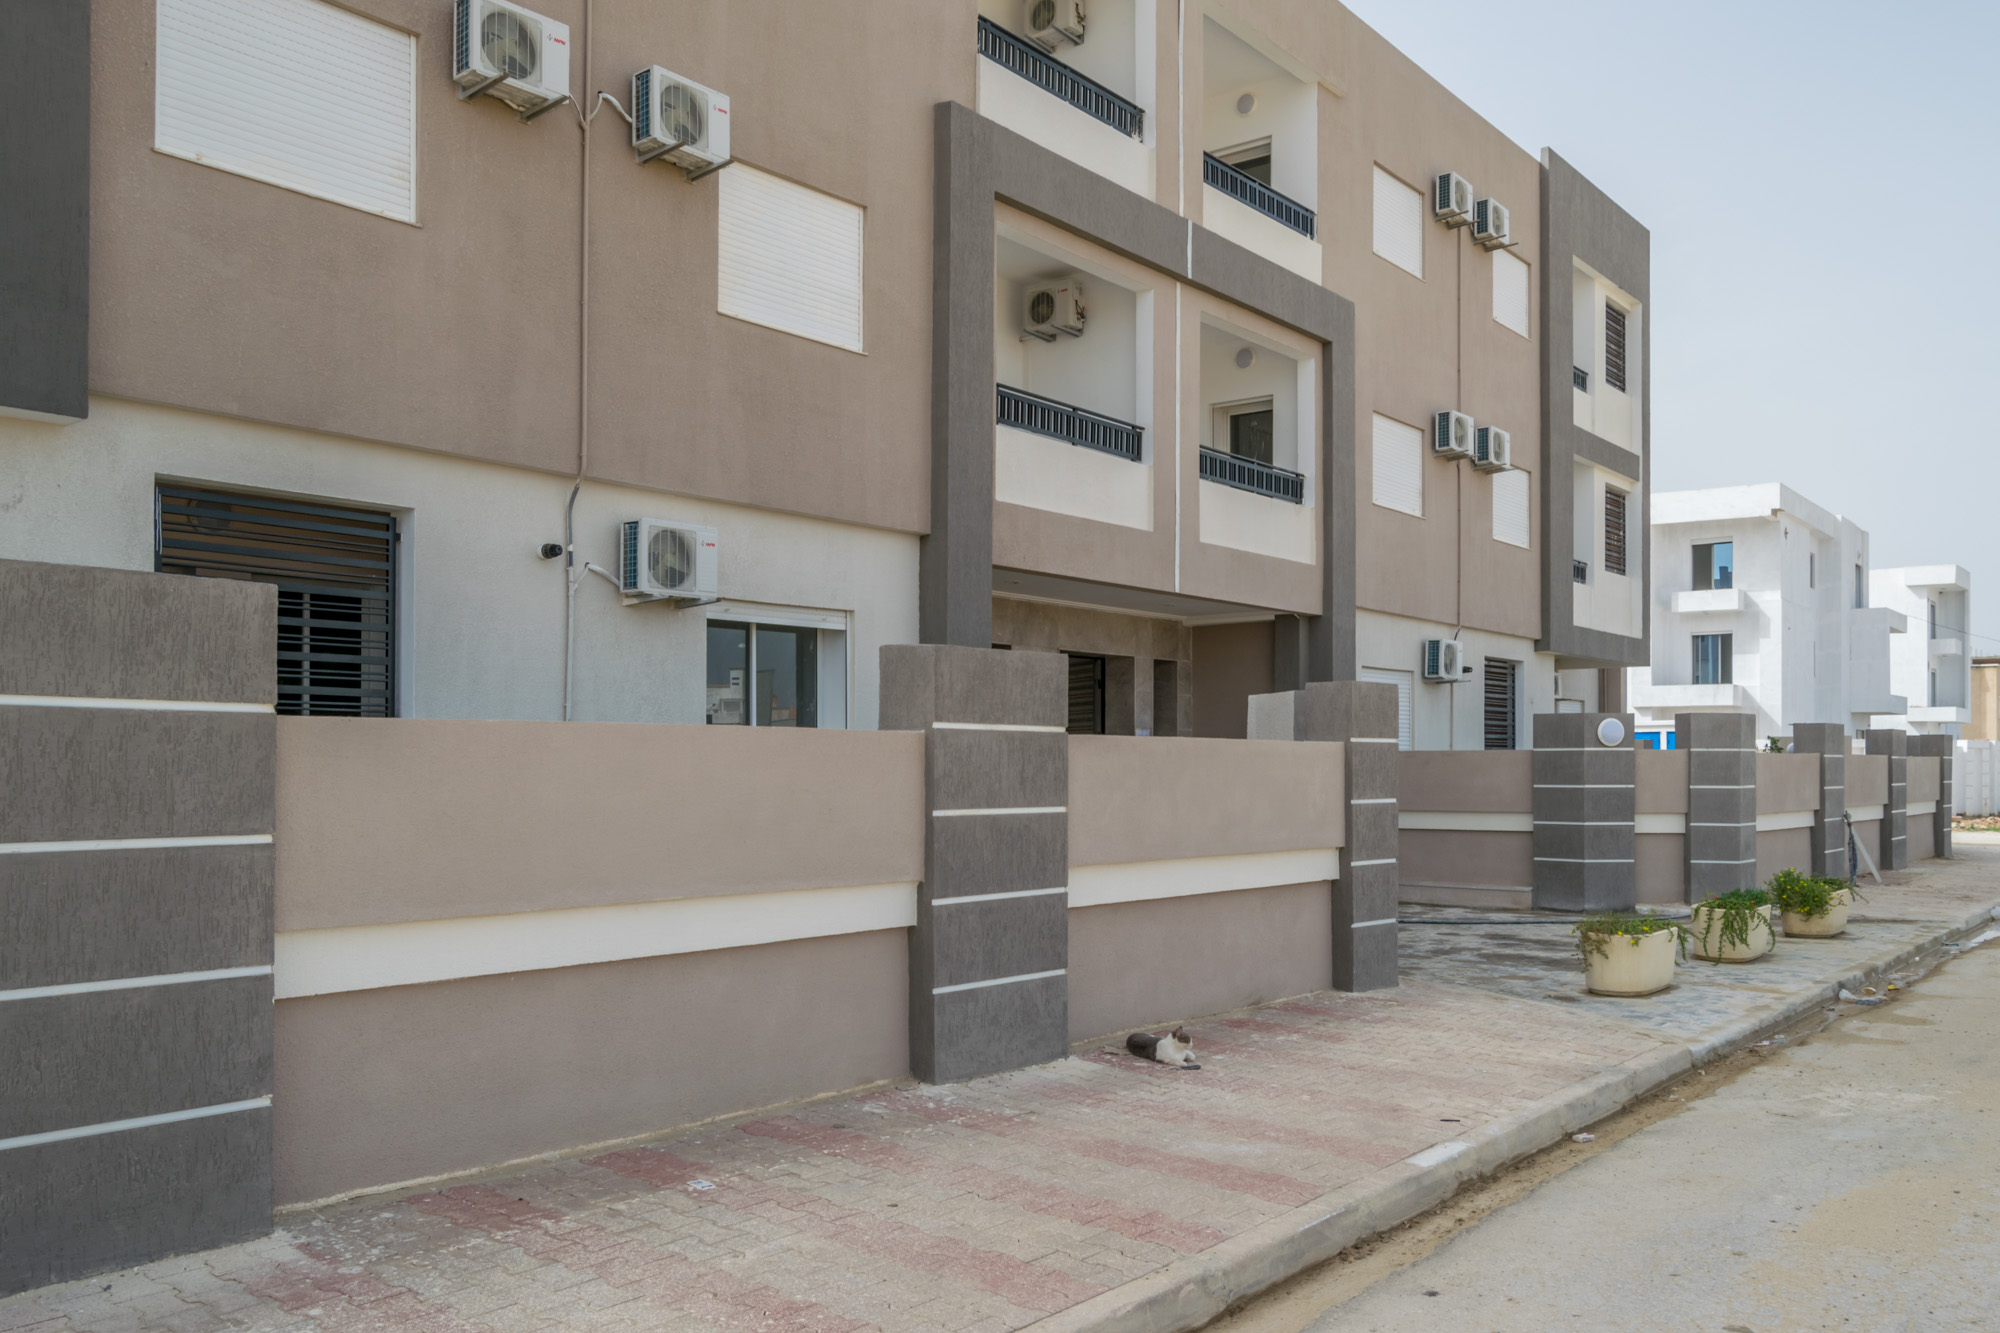 Dsc 3213 immobilier neuf tunisie - Residence de haut standing rubio ...